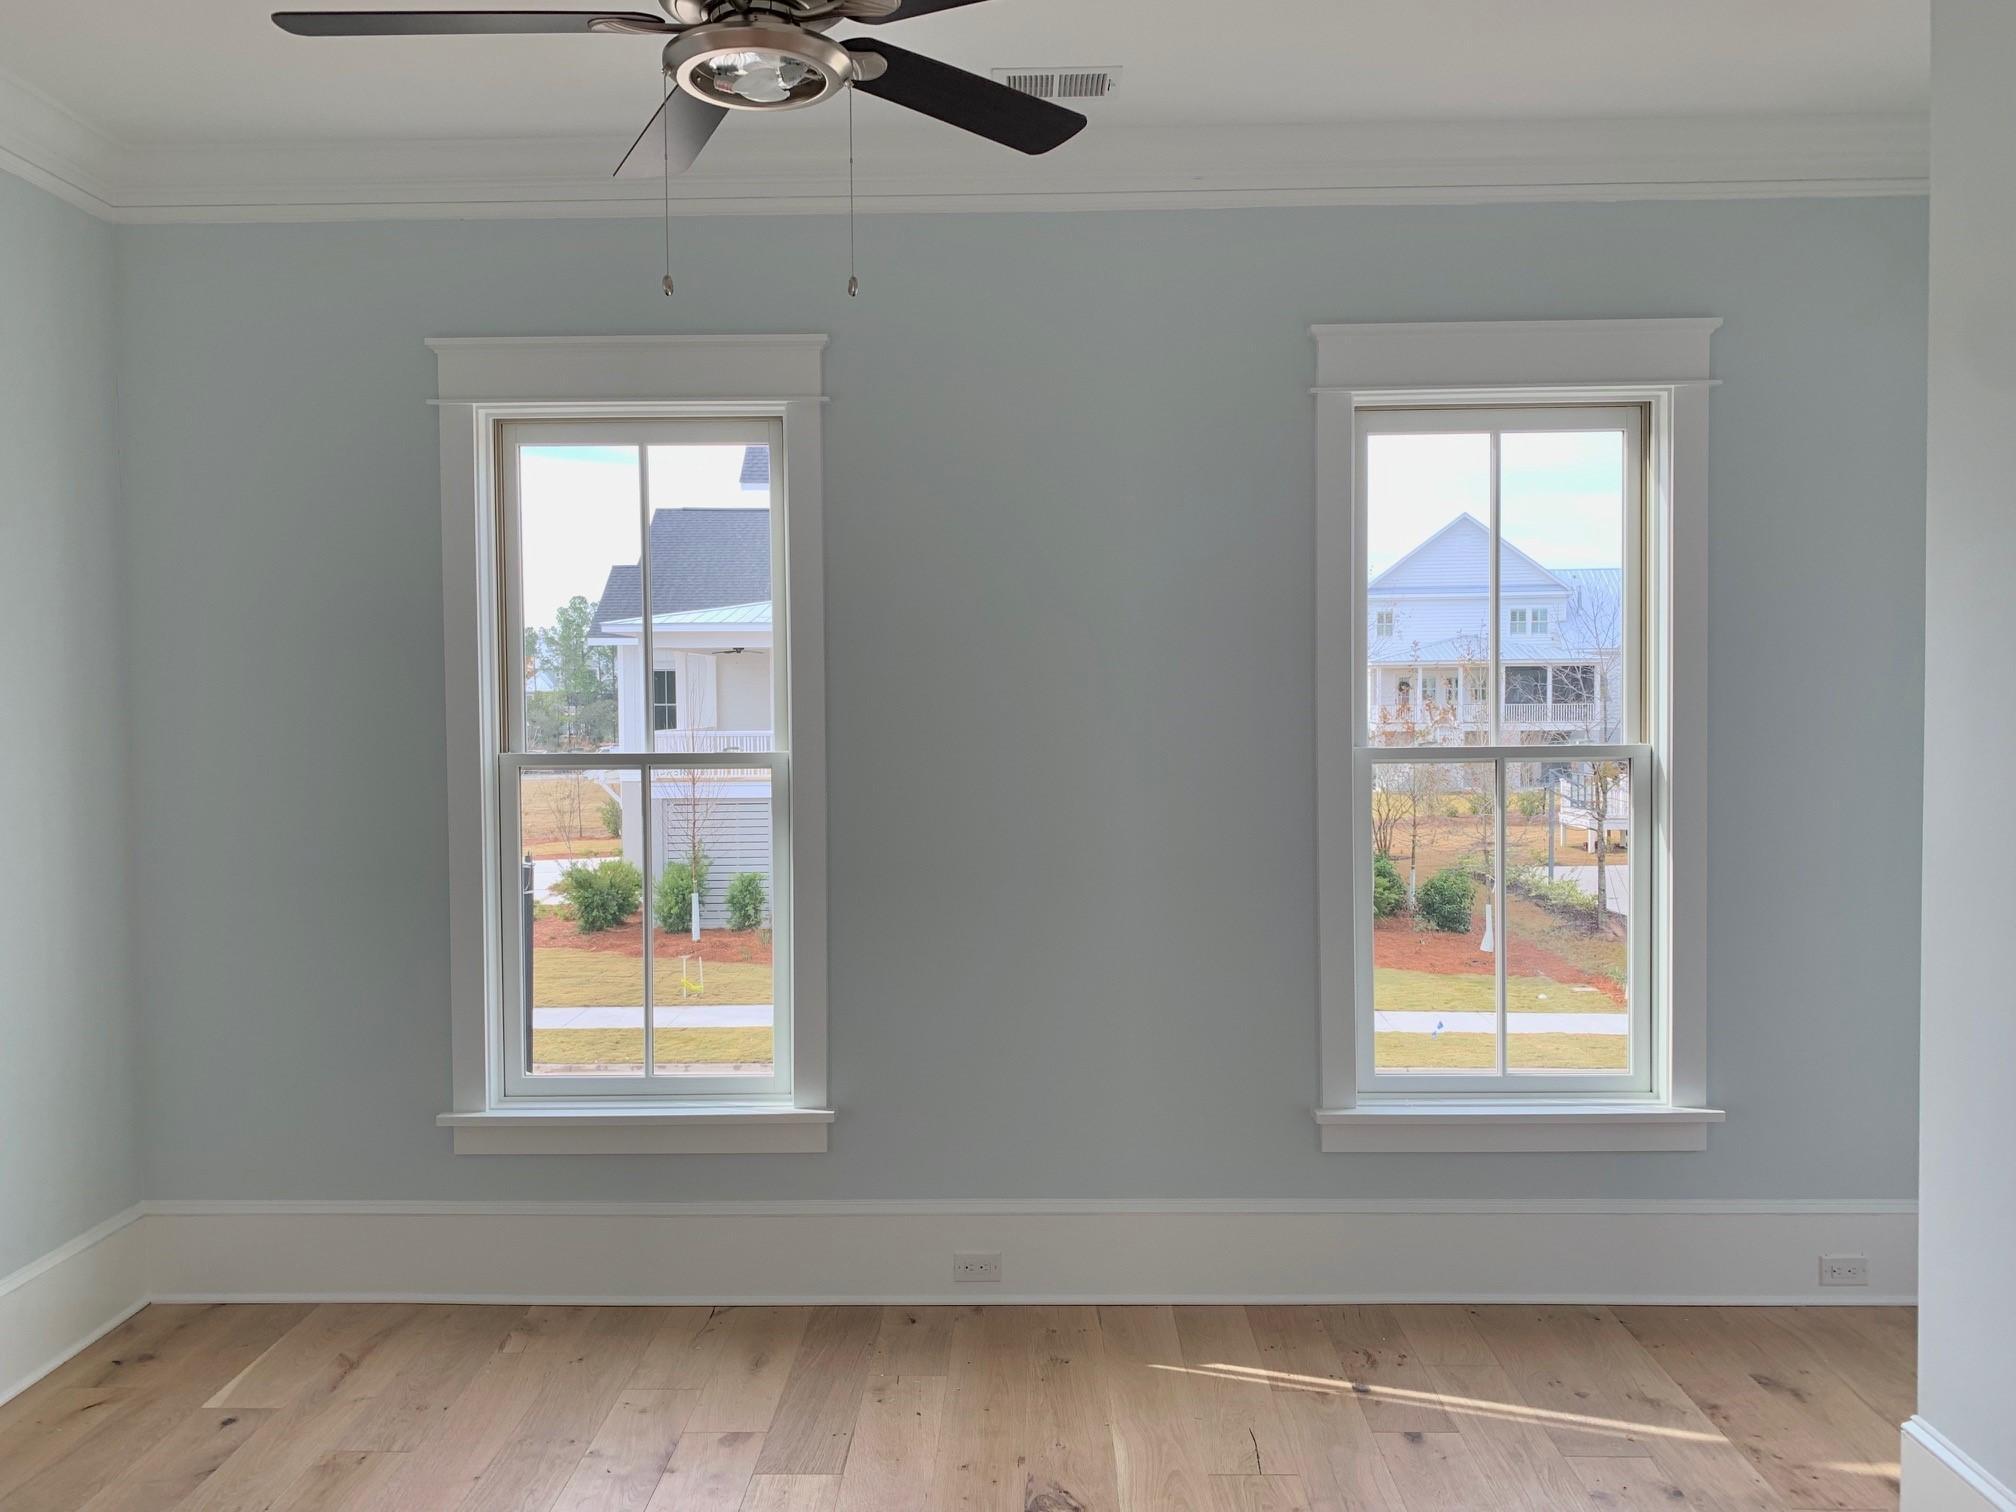 Daniel Island Homes For Sale - 206 Foundry, Charleston, SC - 13